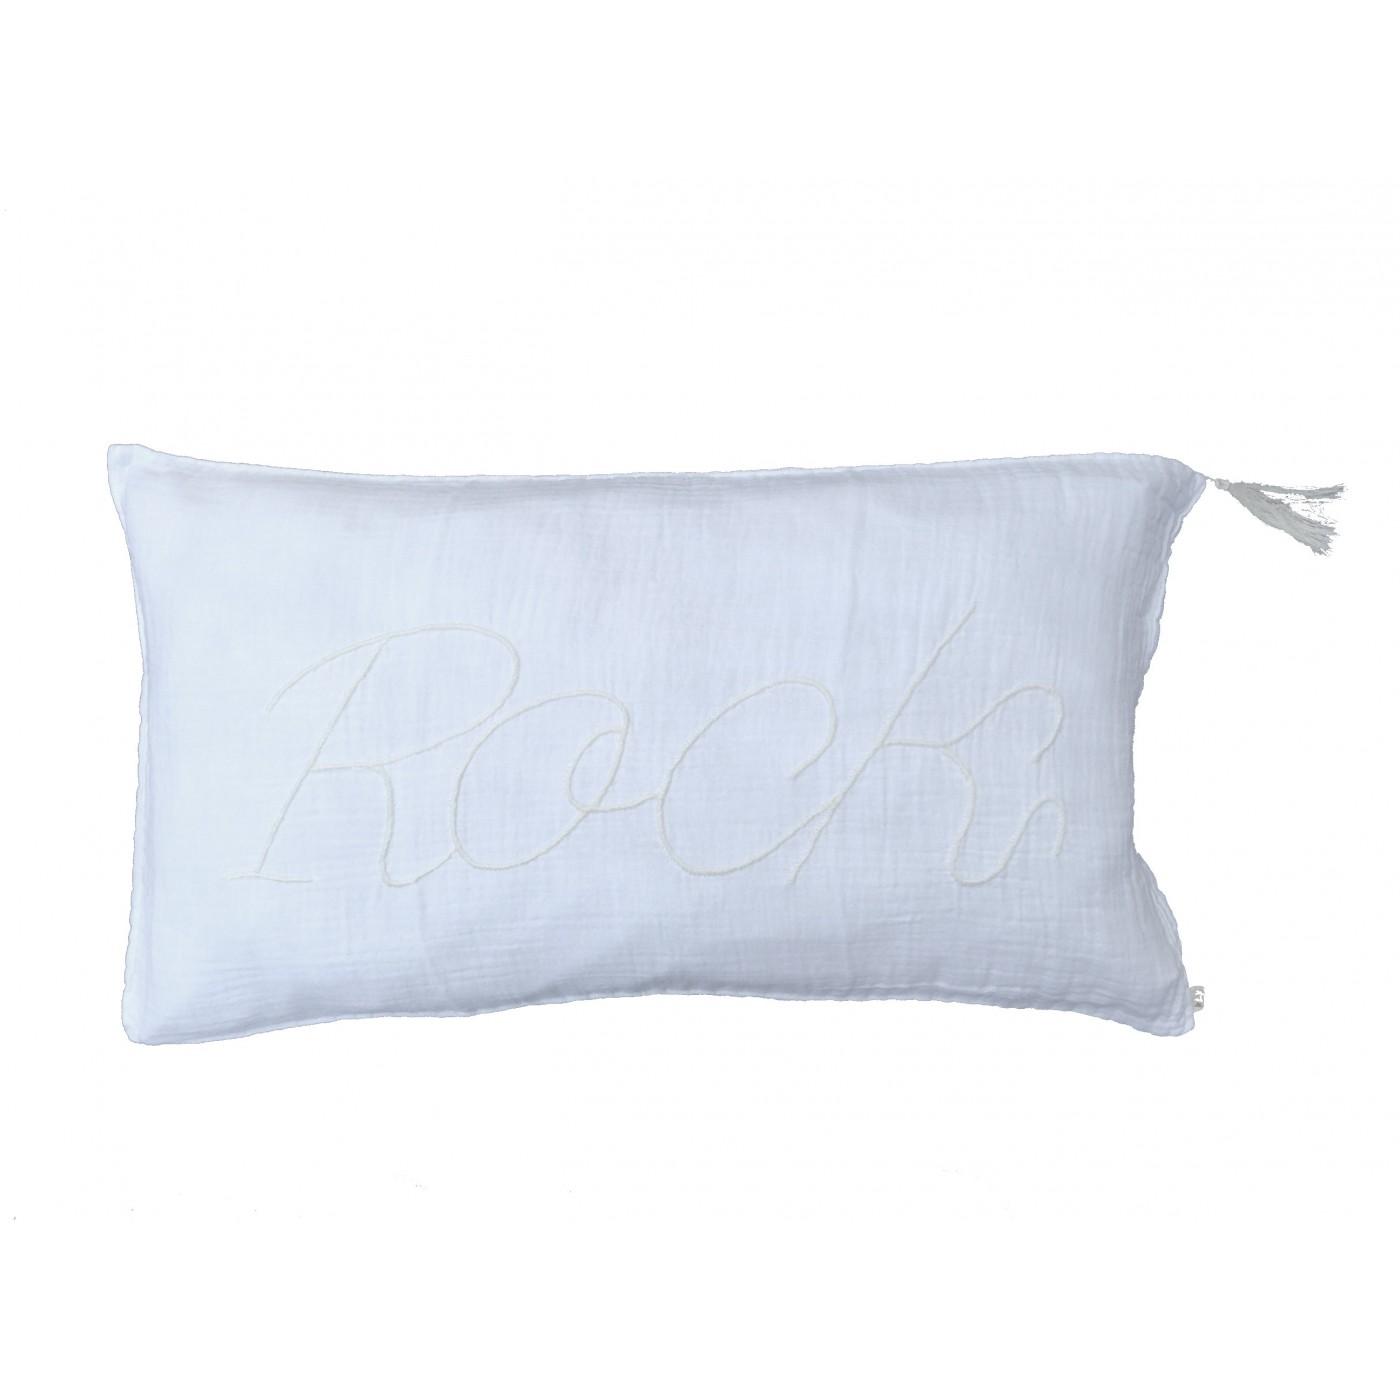 coussin blanc c 39 est blanc 40x70 rock yadayada. Black Bedroom Furniture Sets. Home Design Ideas